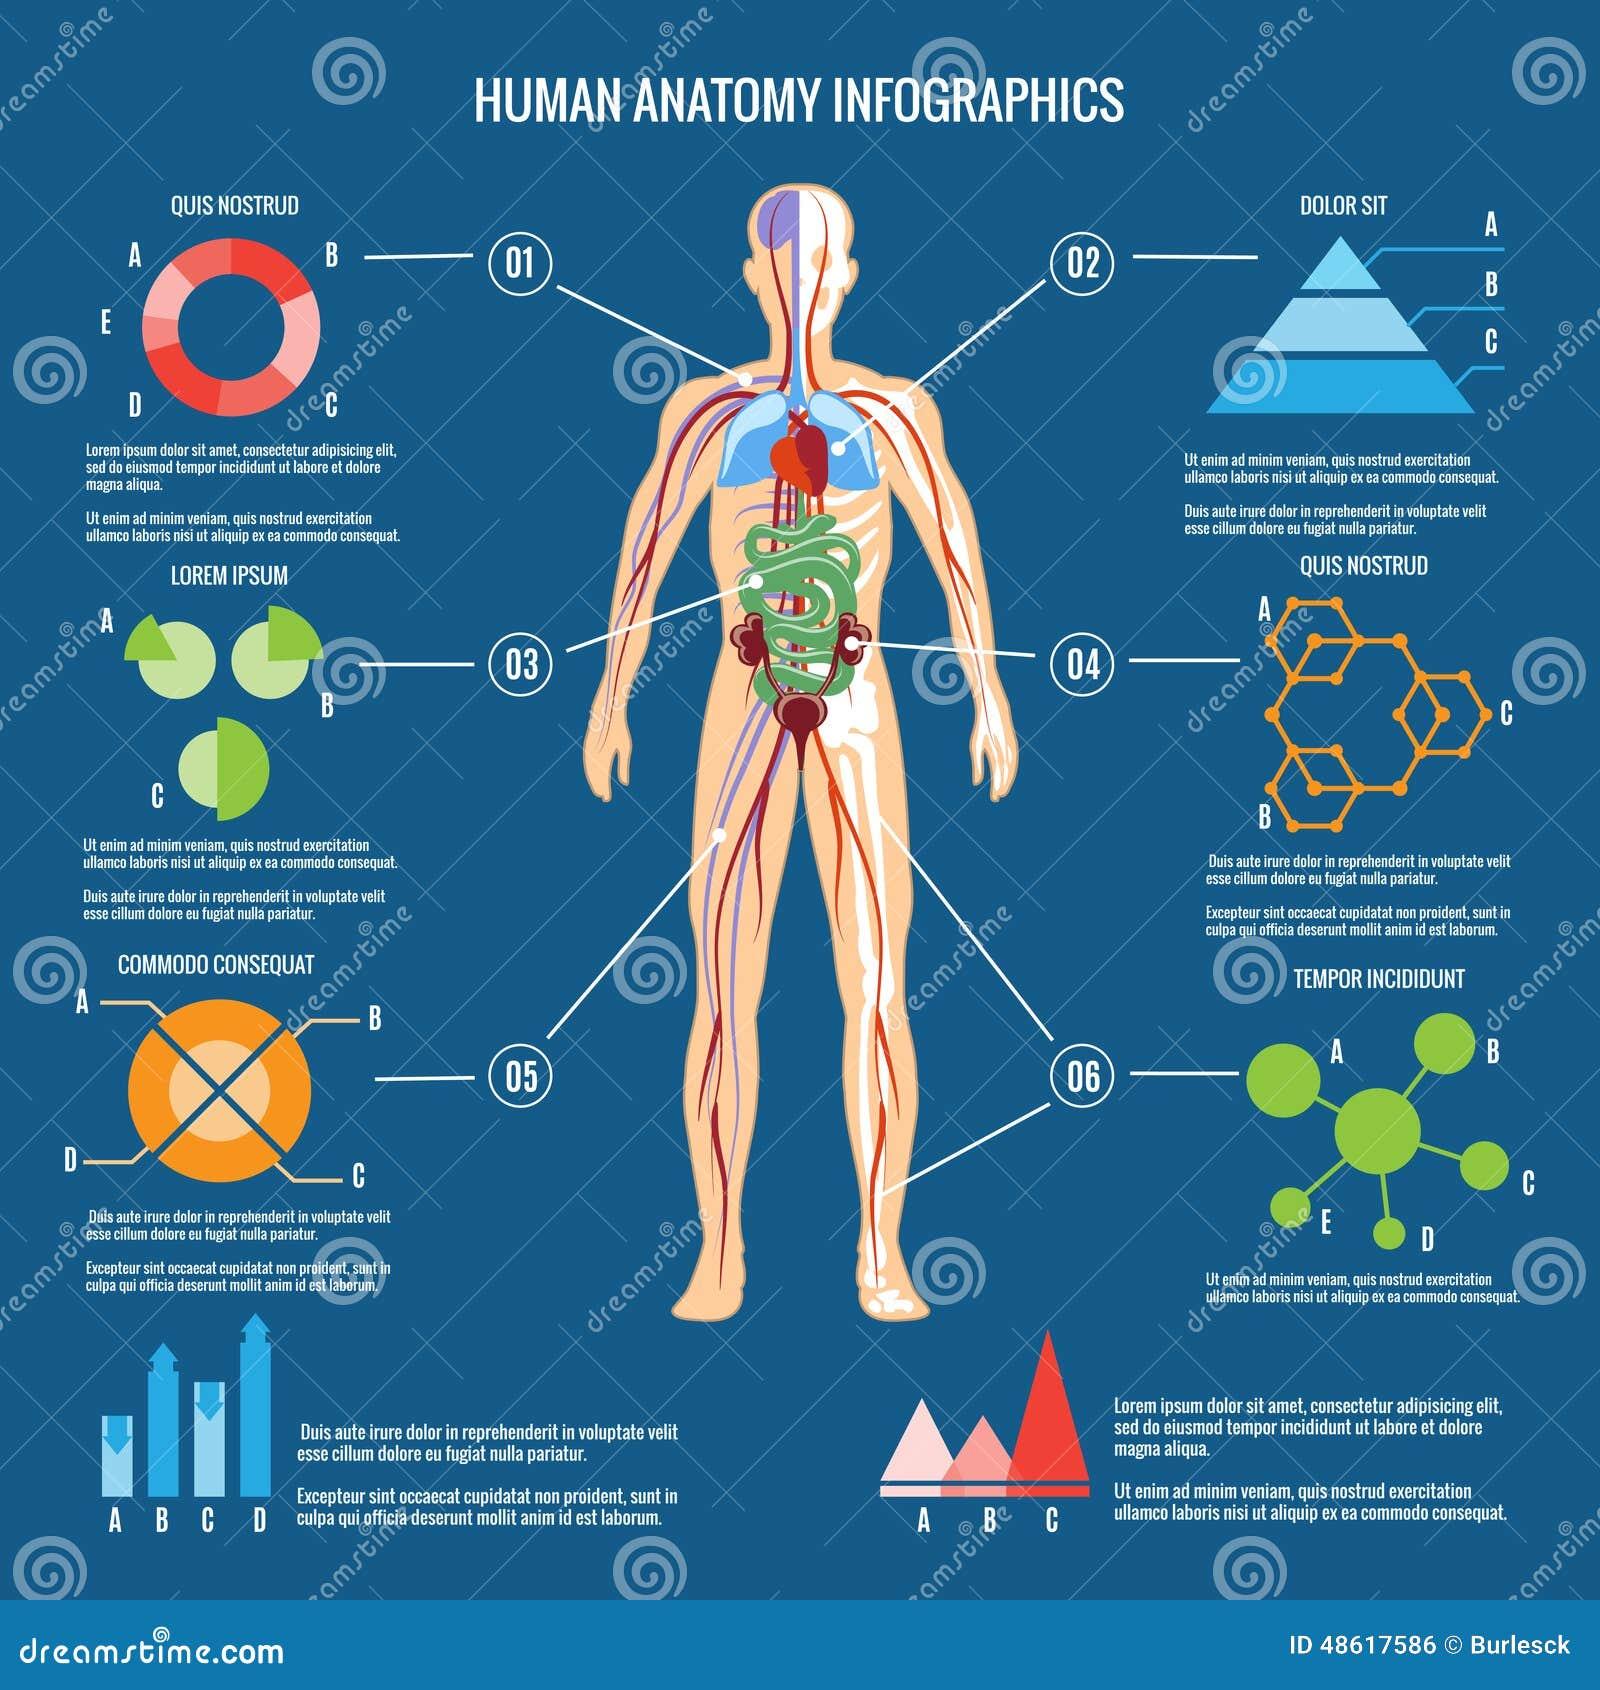 Human Body Anatomy Infographic Design Stock Vector - Illustration of ...